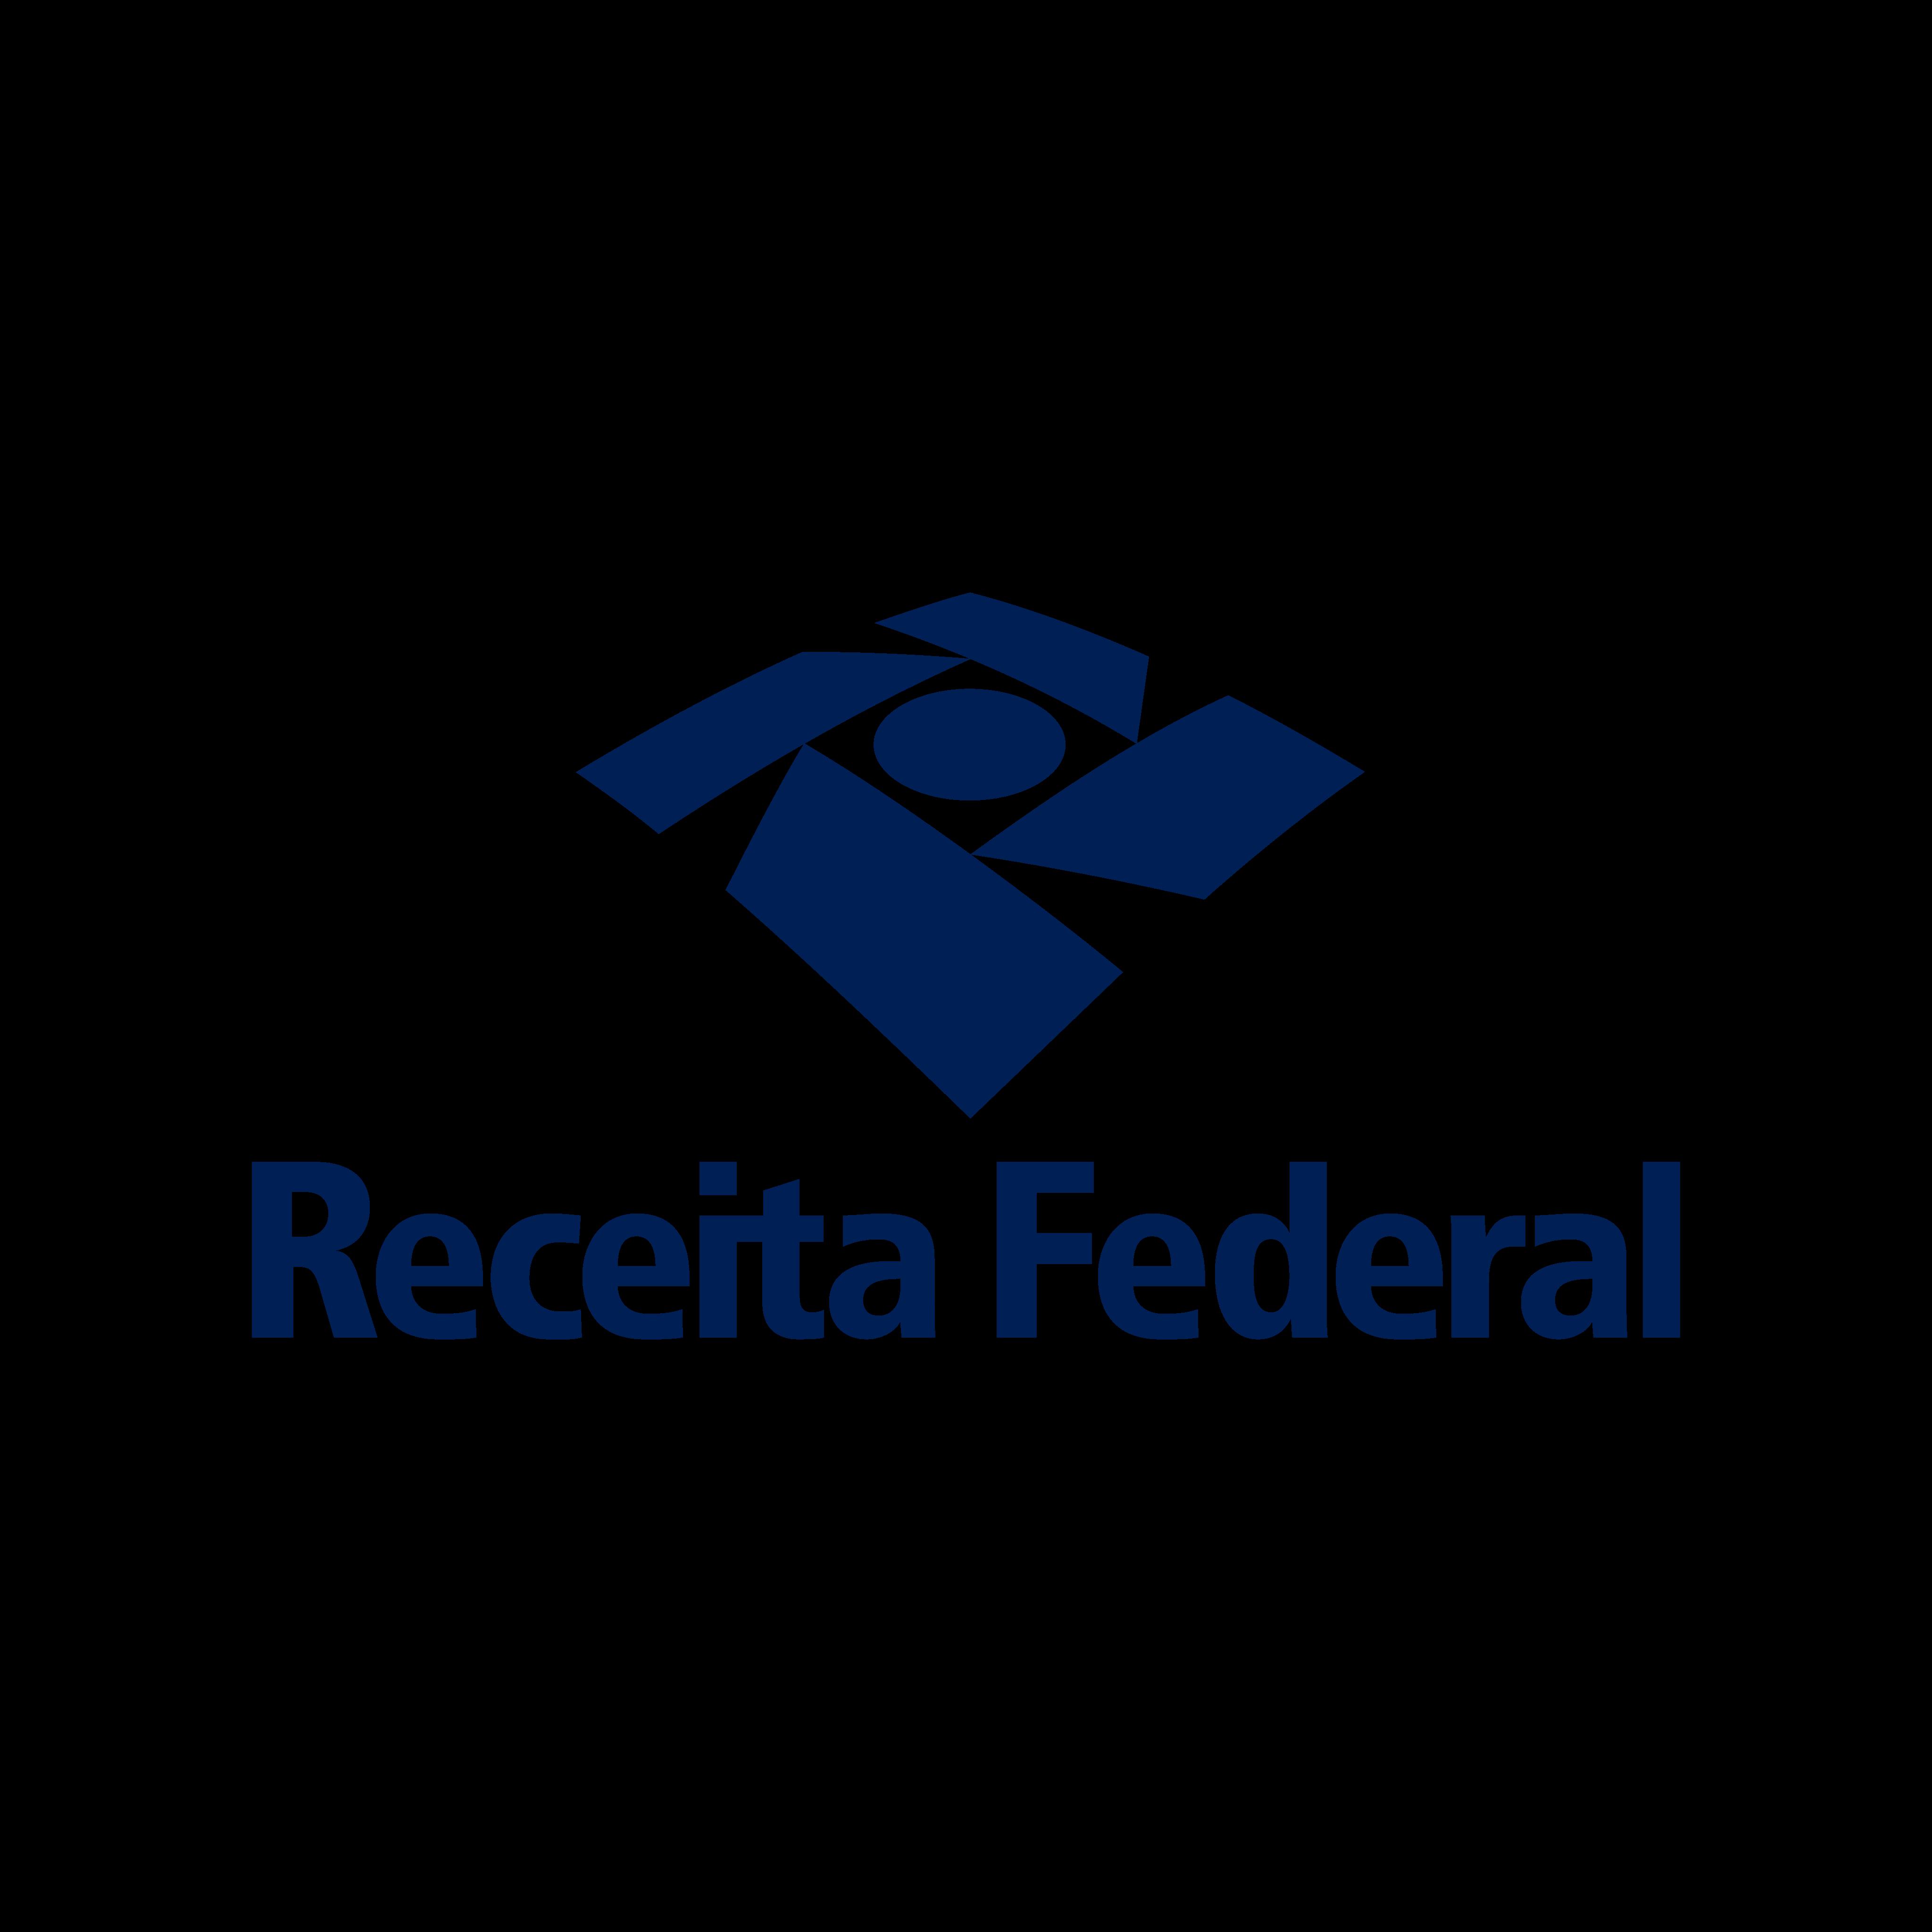 receita federal logo 0 - Receita Federal Logo